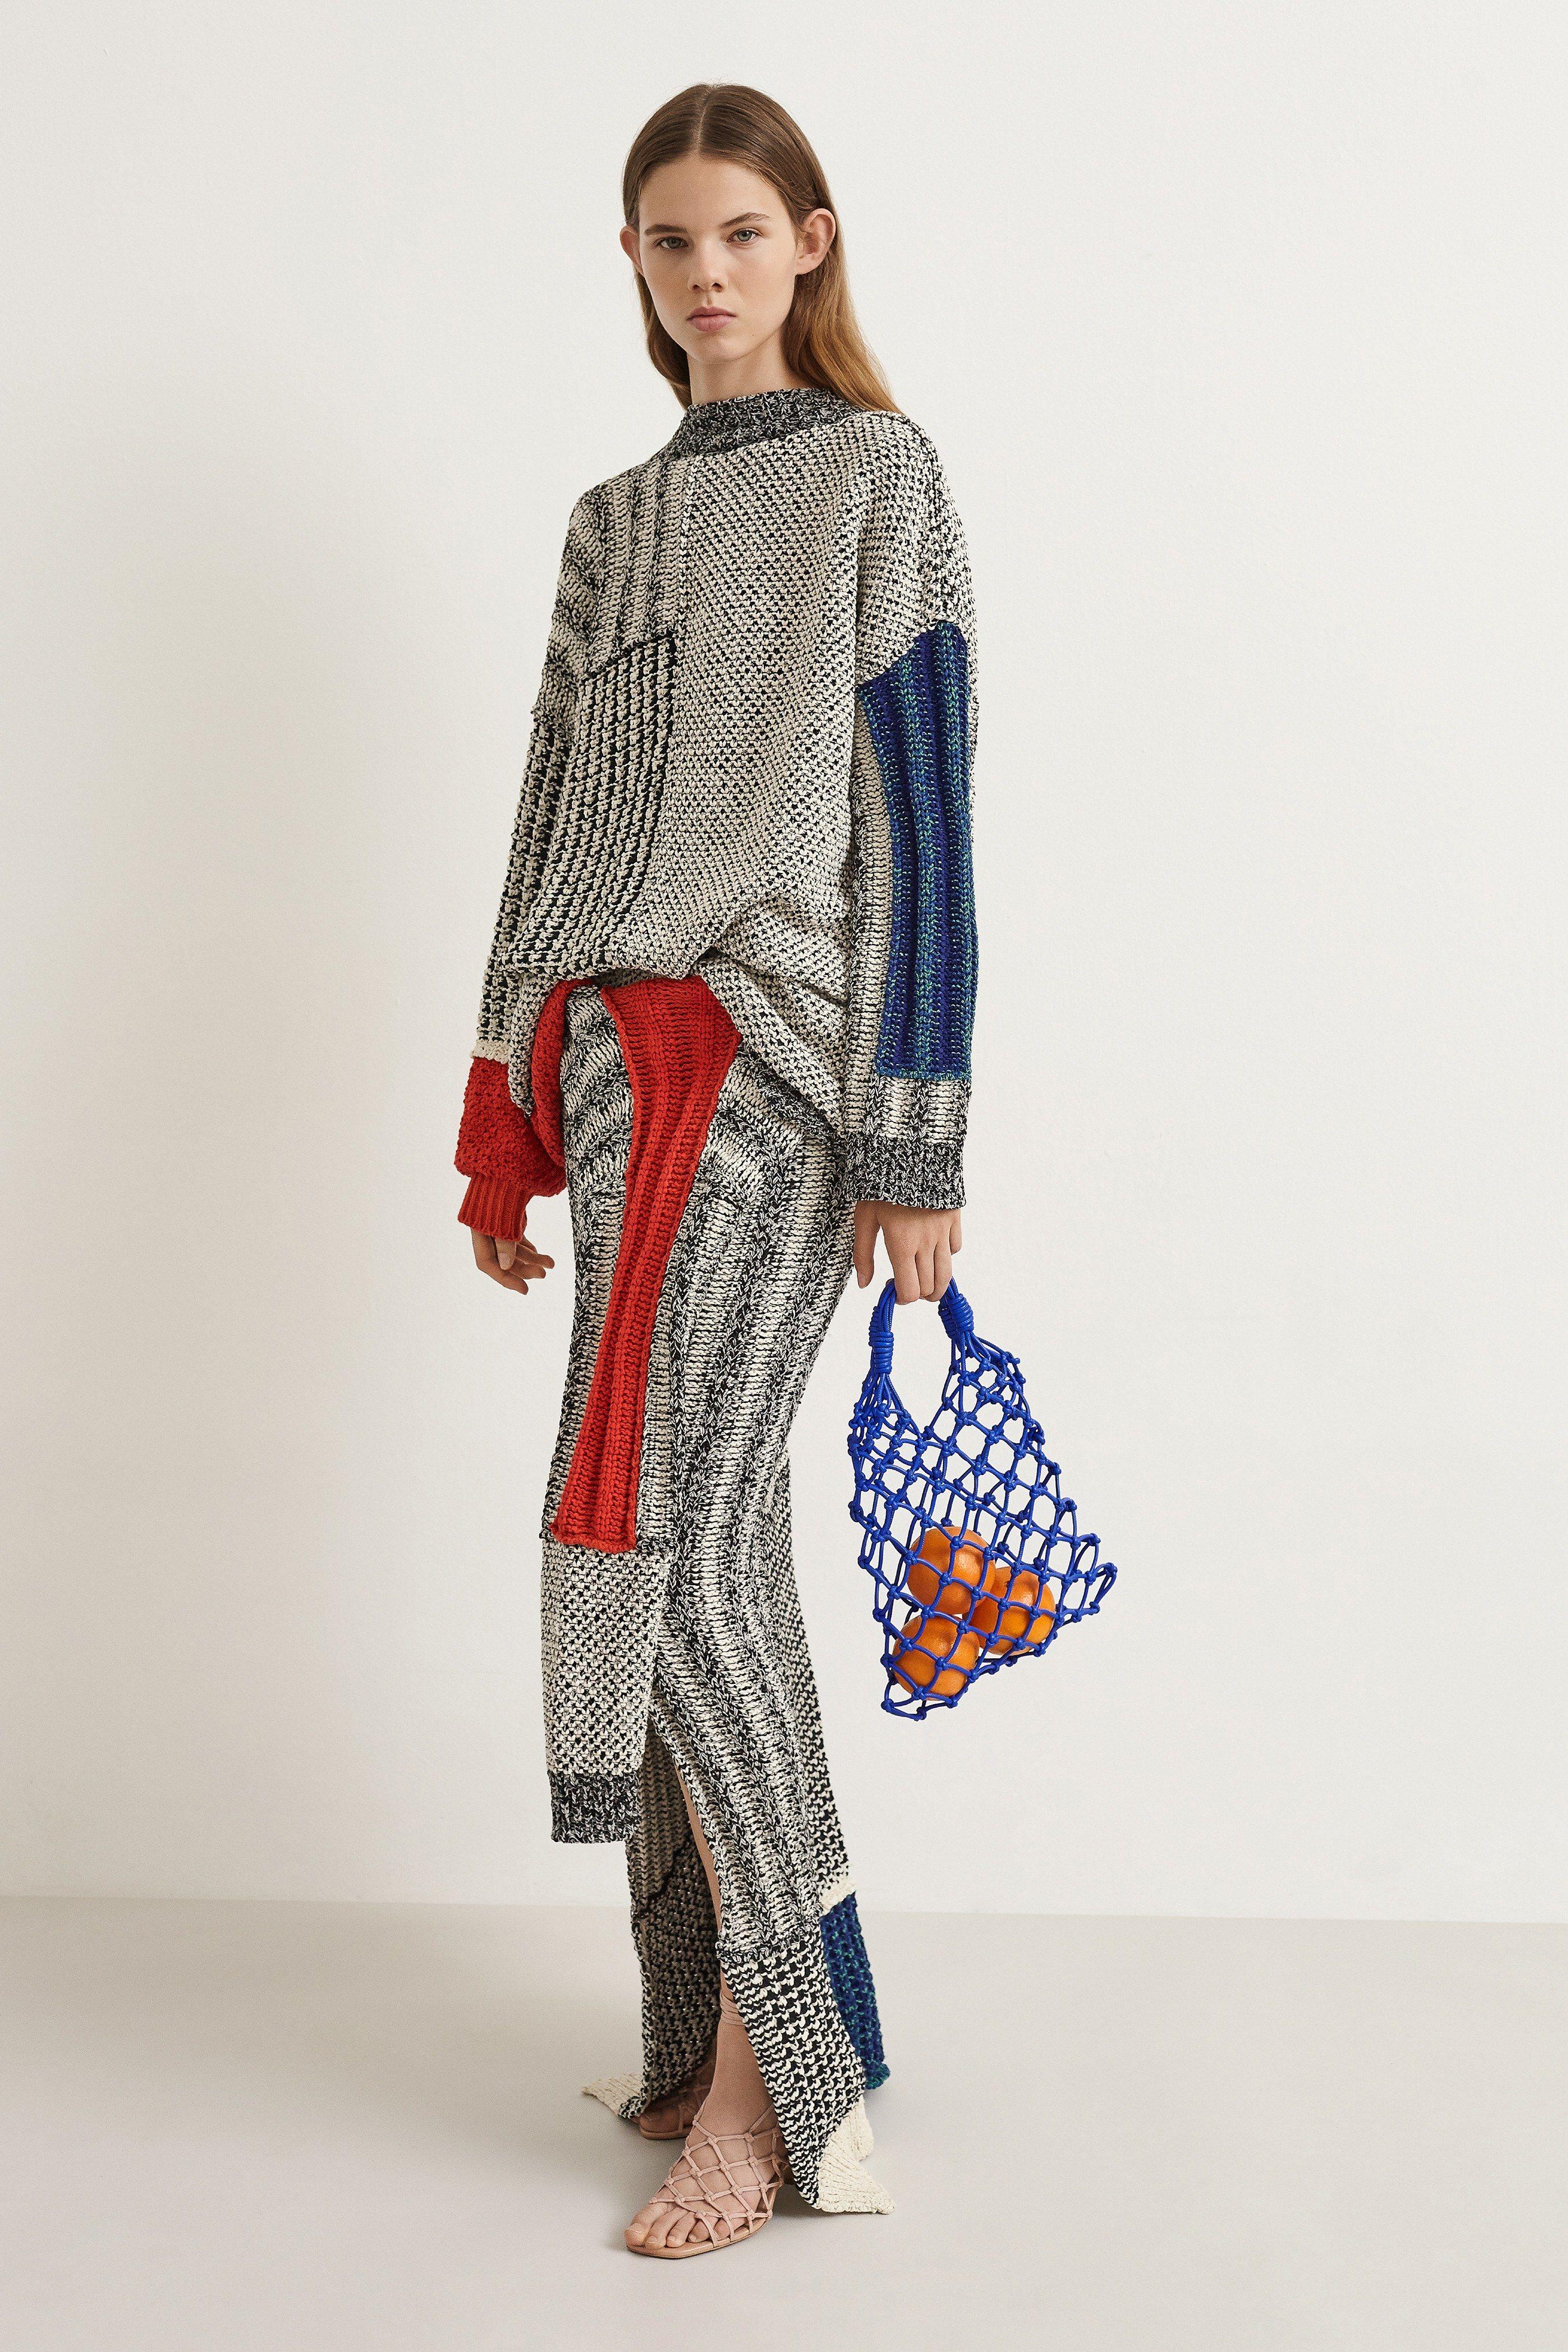 Stella McCartney Resort 2020 Fashion Show in 2020